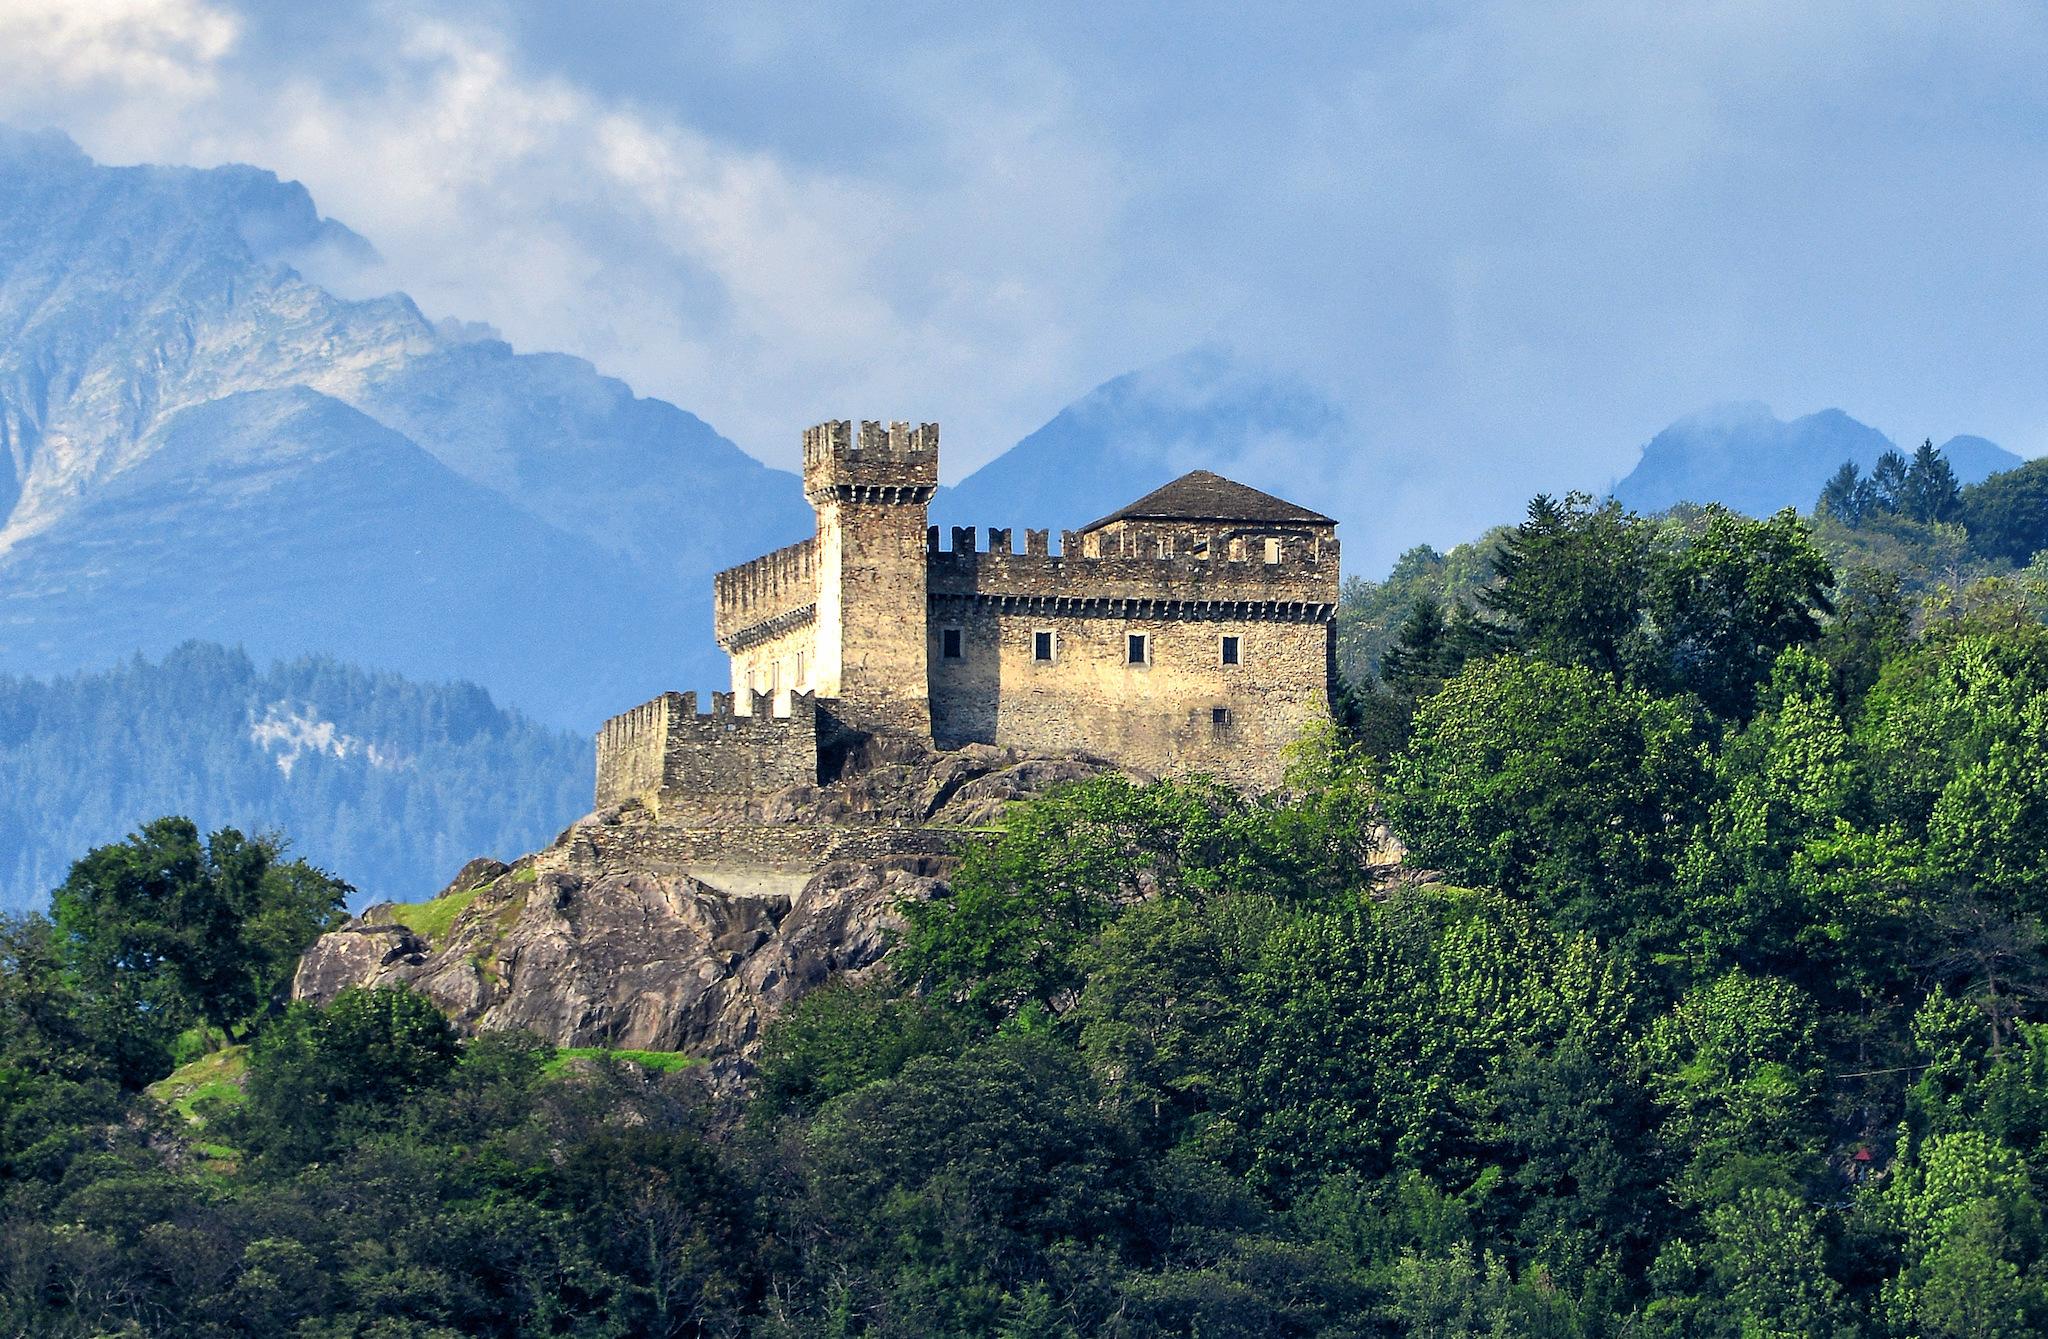 Castello Sasso Corbaro, Castles of Bellinzona, Ticino